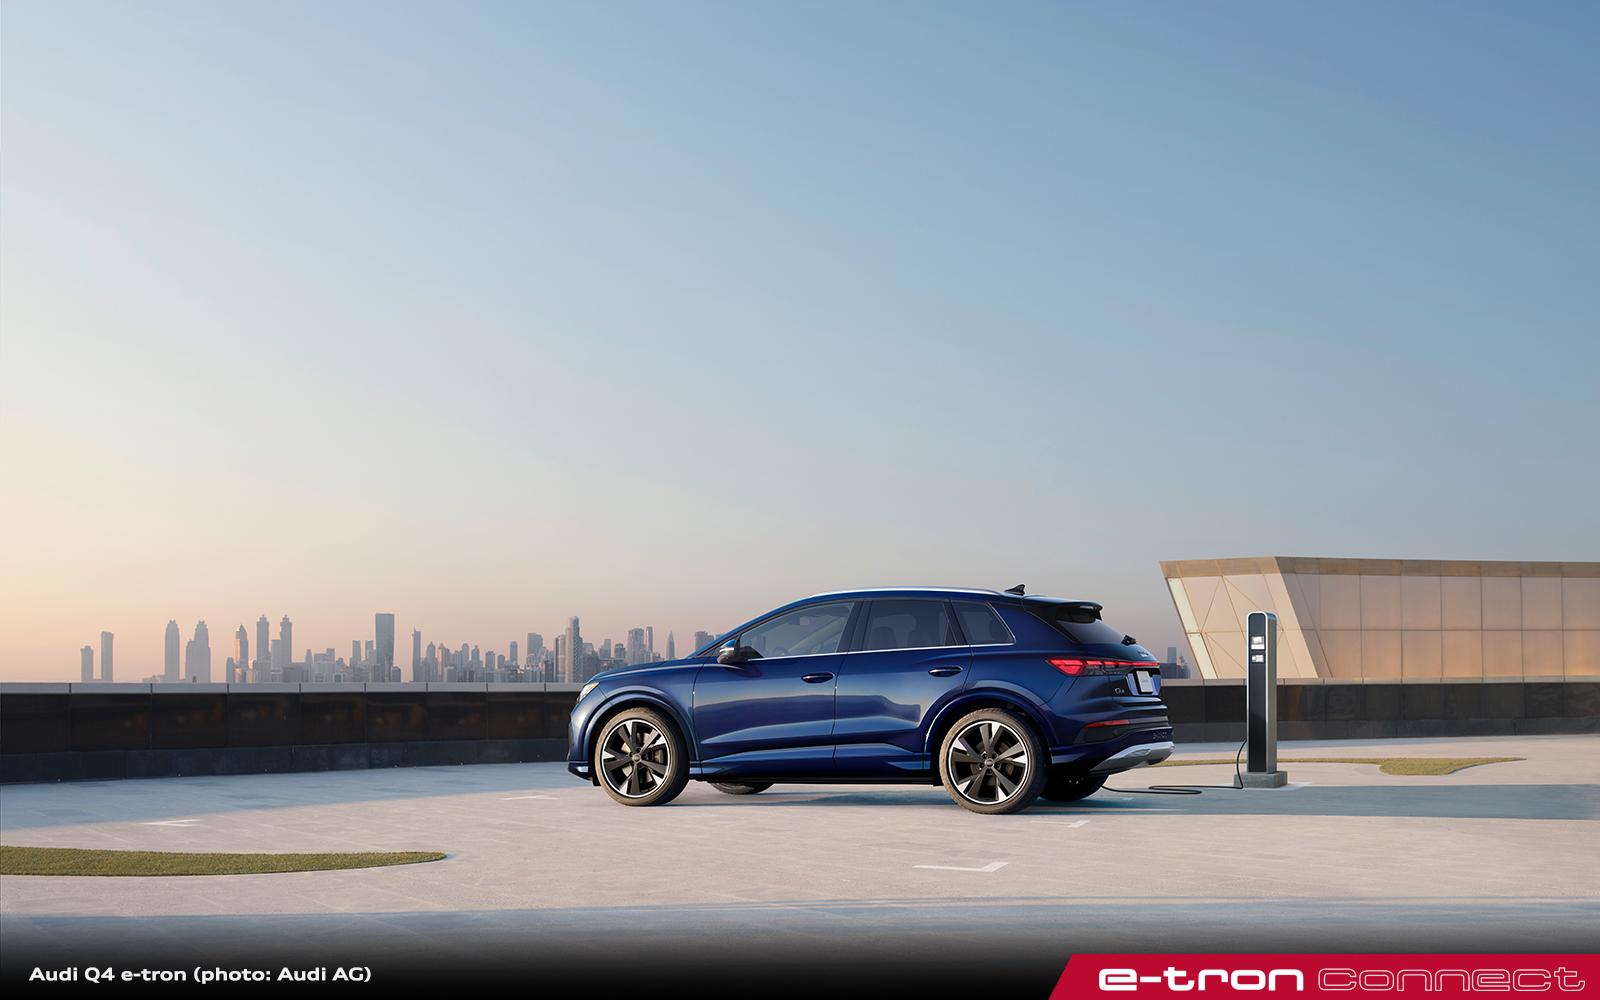 Audi Q4 e-tron: Progressive. Approachable. Premium Electric Mobility.